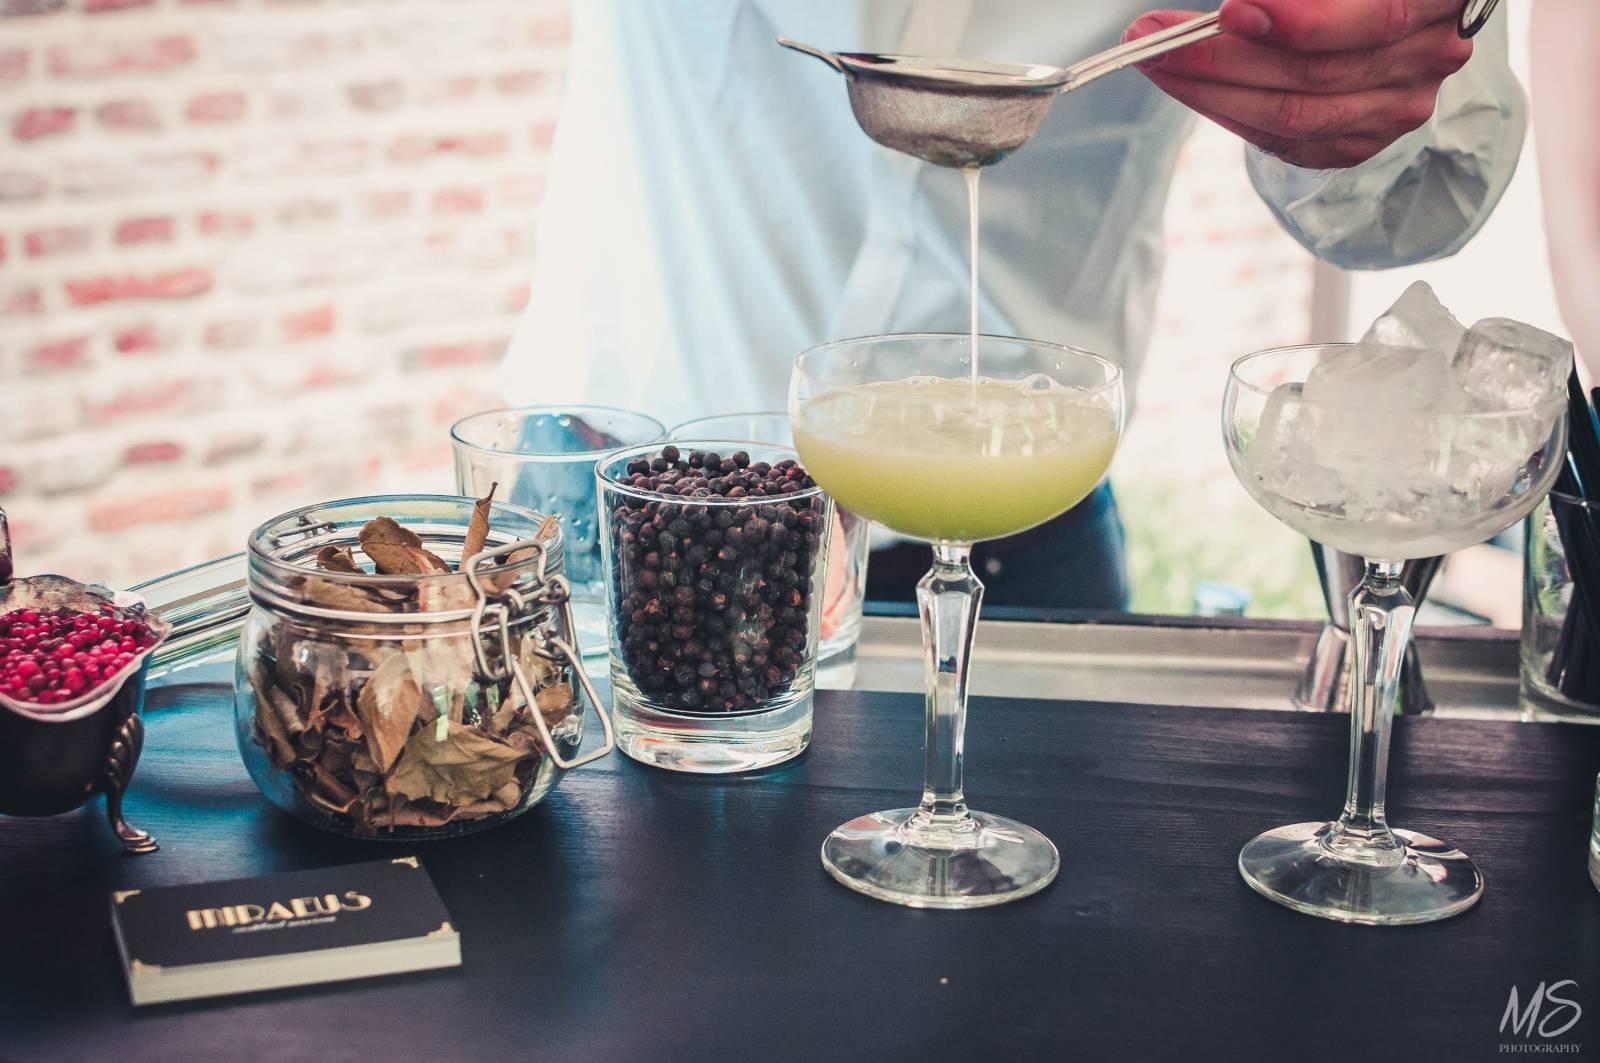 Miraeus - Cocktails - Mobiele Bars - House of Weddings - 6